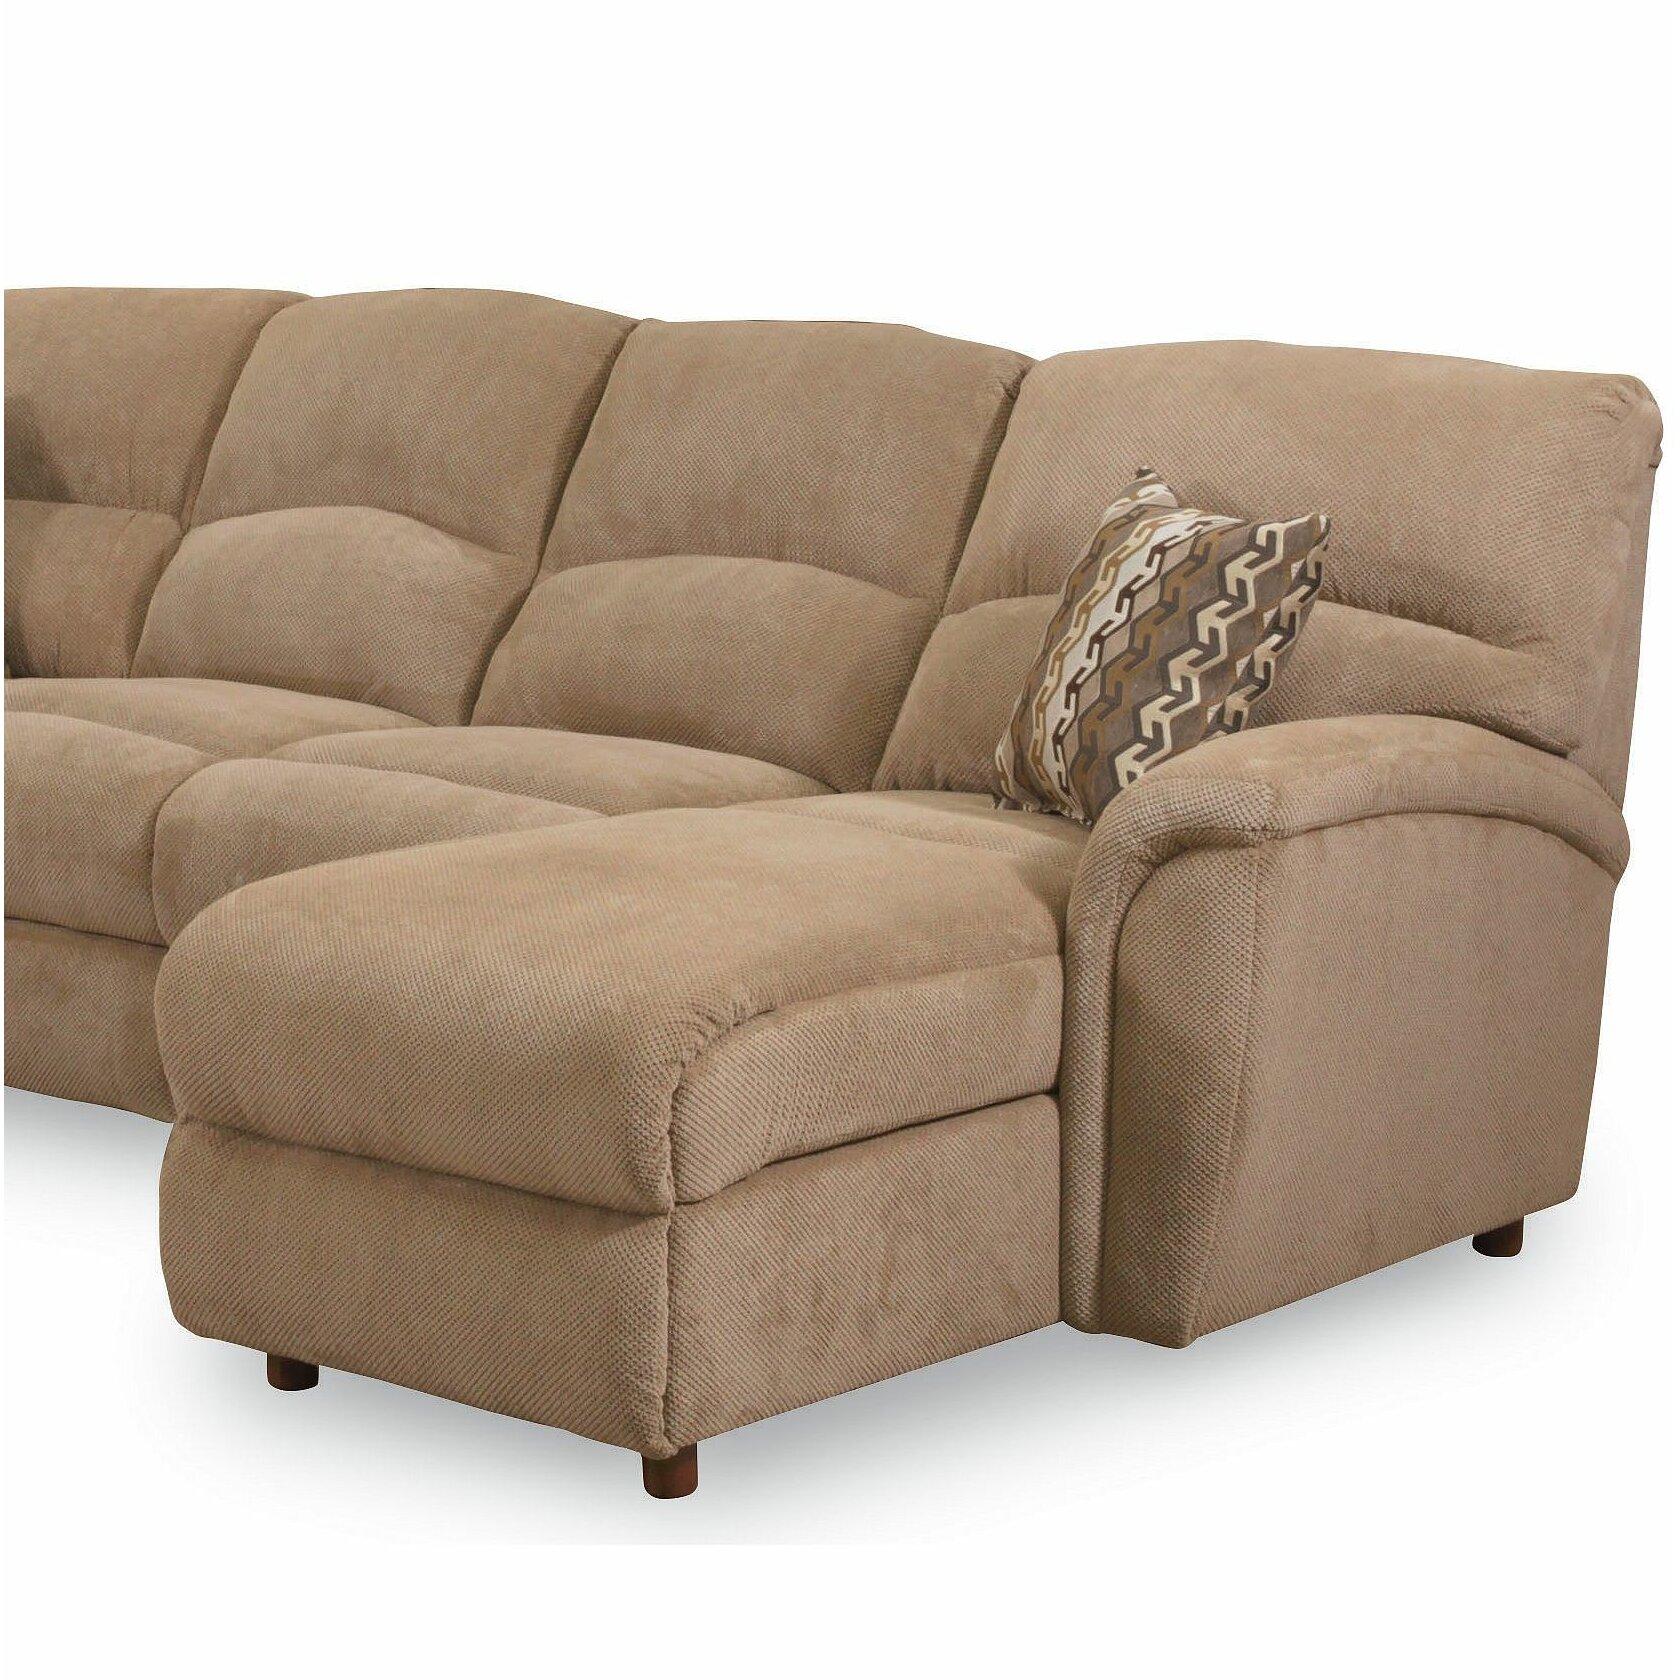 Lane Furniture Grand Torino Sleeper Sectional & Reviews ...